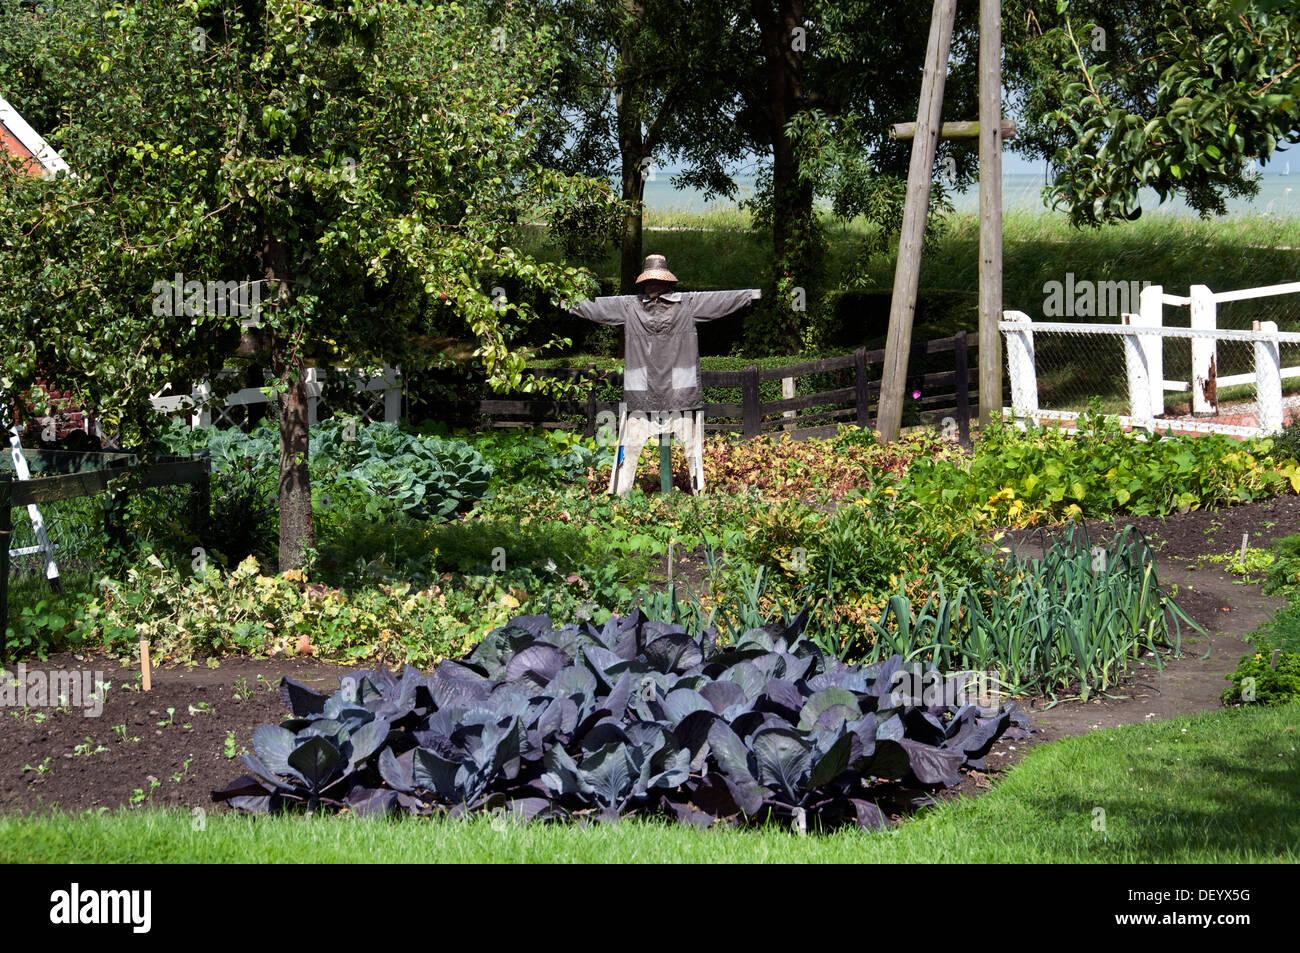 Scarecrow kitchen garden farm Enkhuizen Zuiderzeemuseum Netherlands - Stock Image